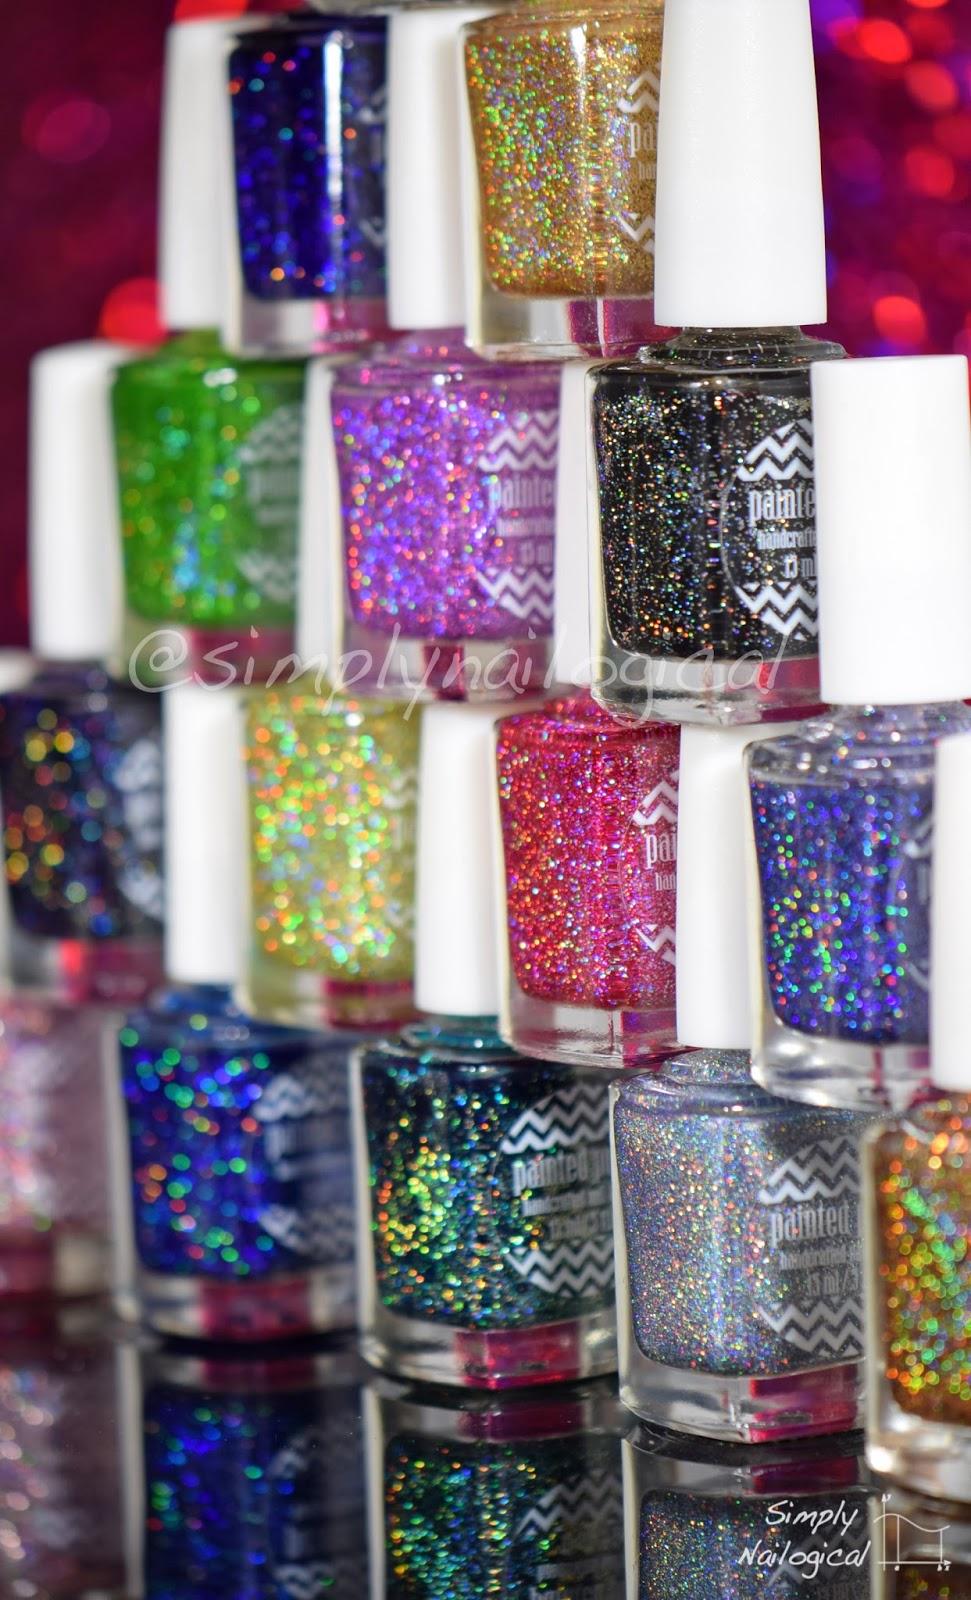 Painted Polish holo glitters